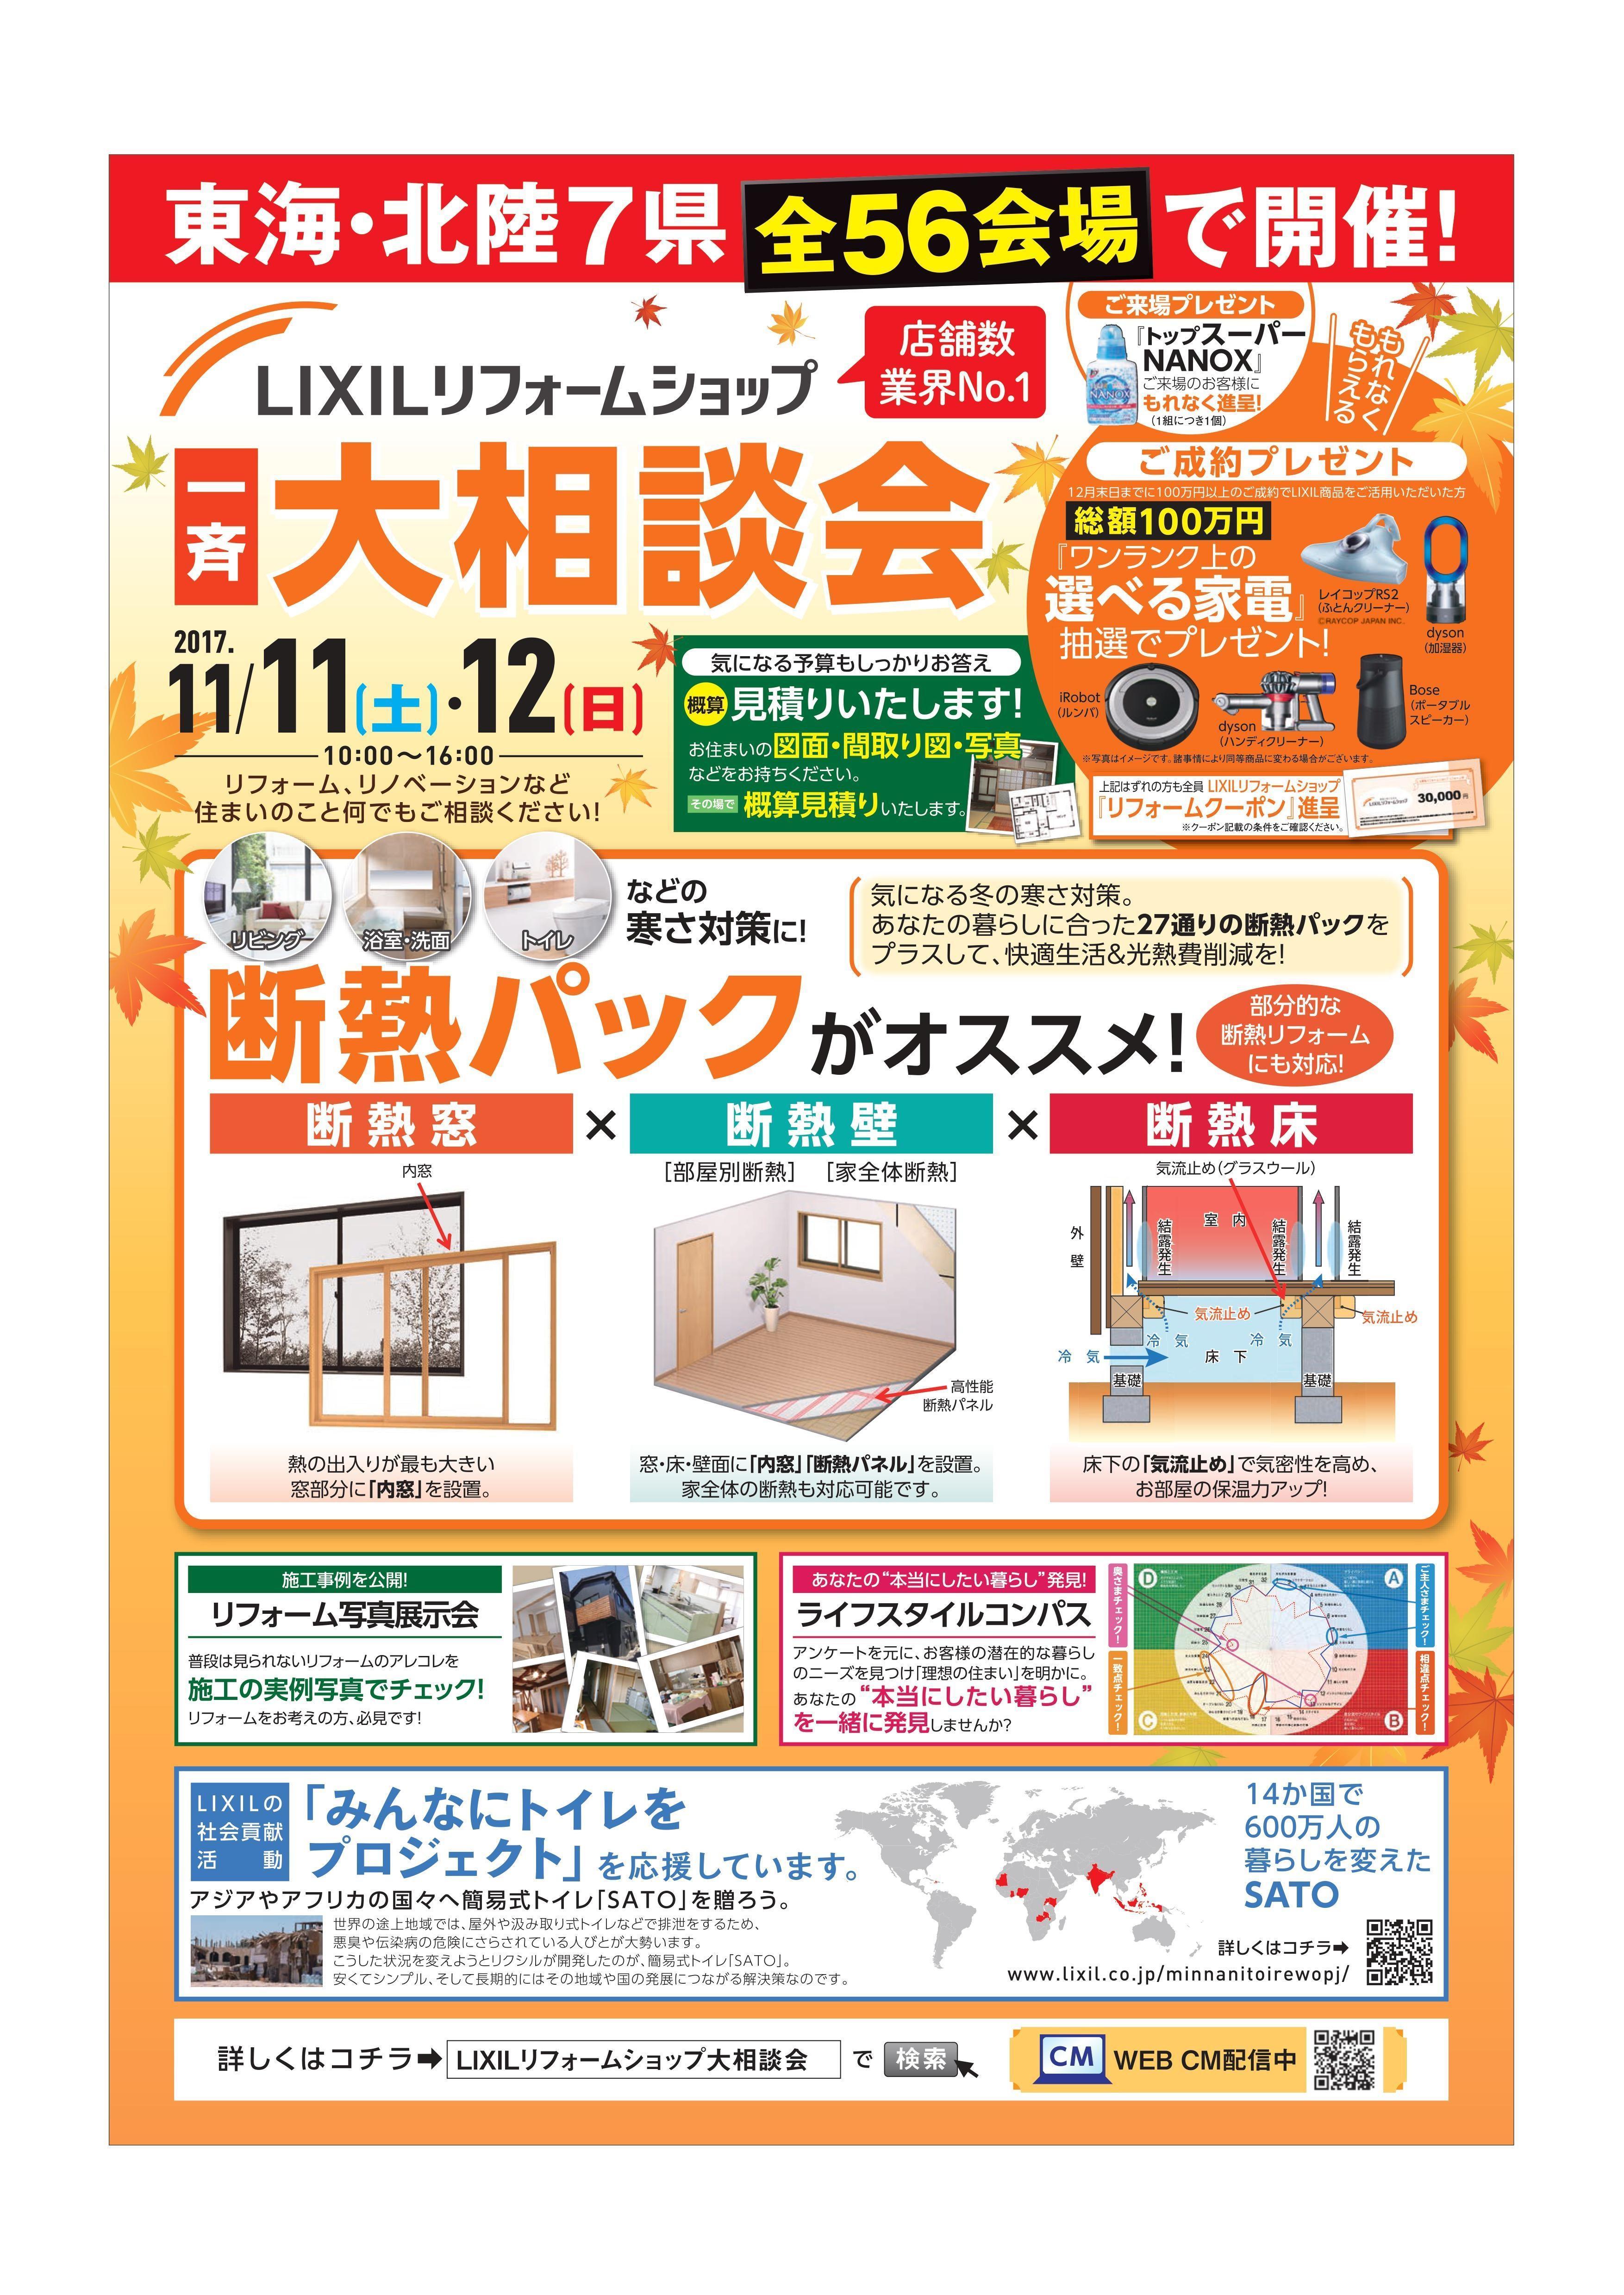 https://www.lixil-reformshop.jp/shop/SP00001079/photos/25254ecfefdc9999abdcccbbad6758b435f2281e.jpg